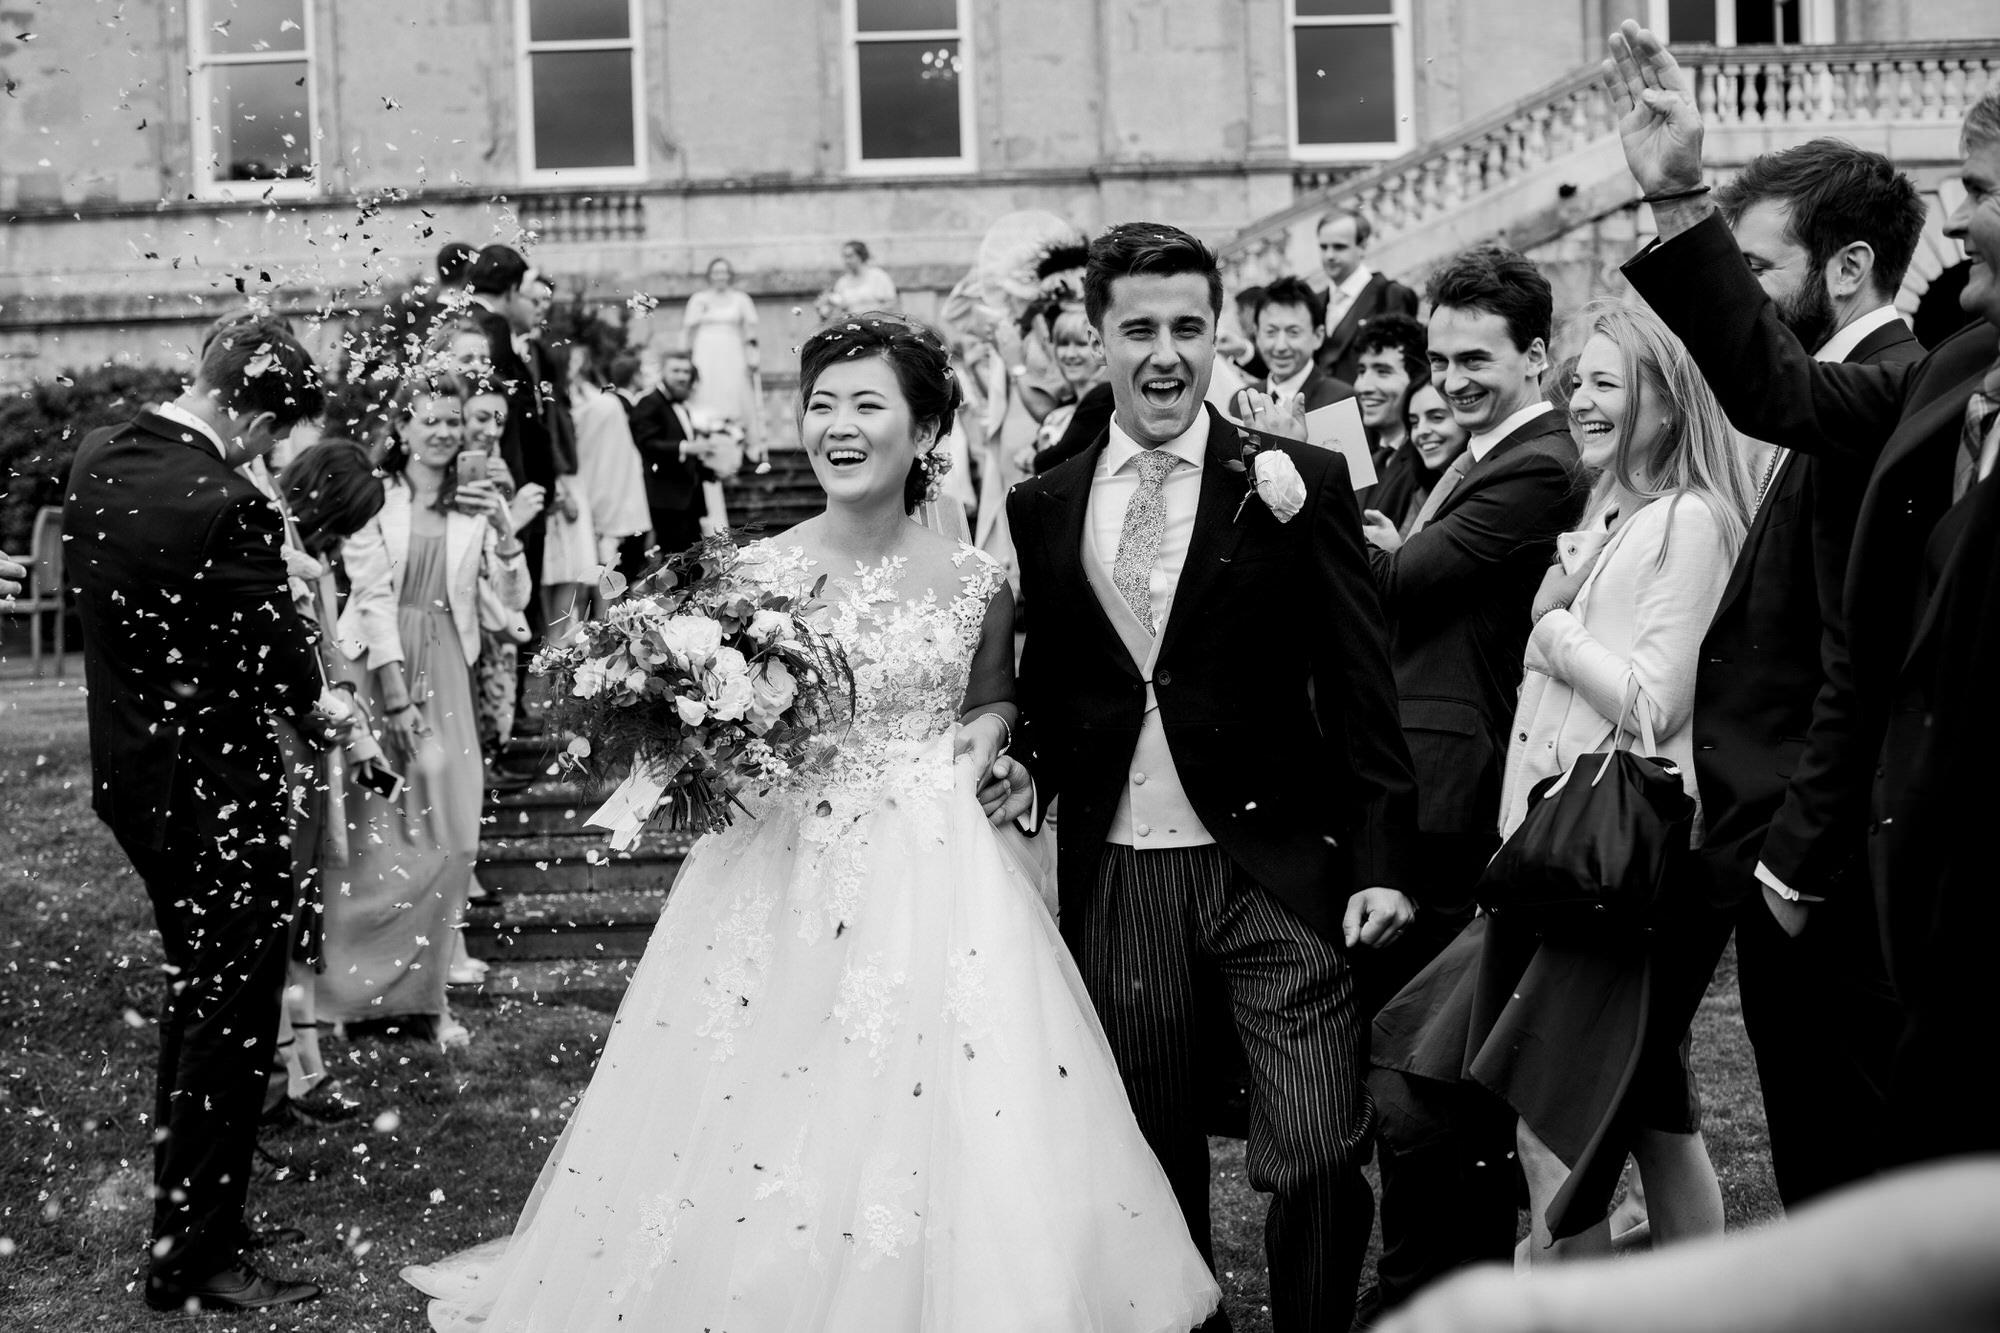 Kirtlington park wedding confetti